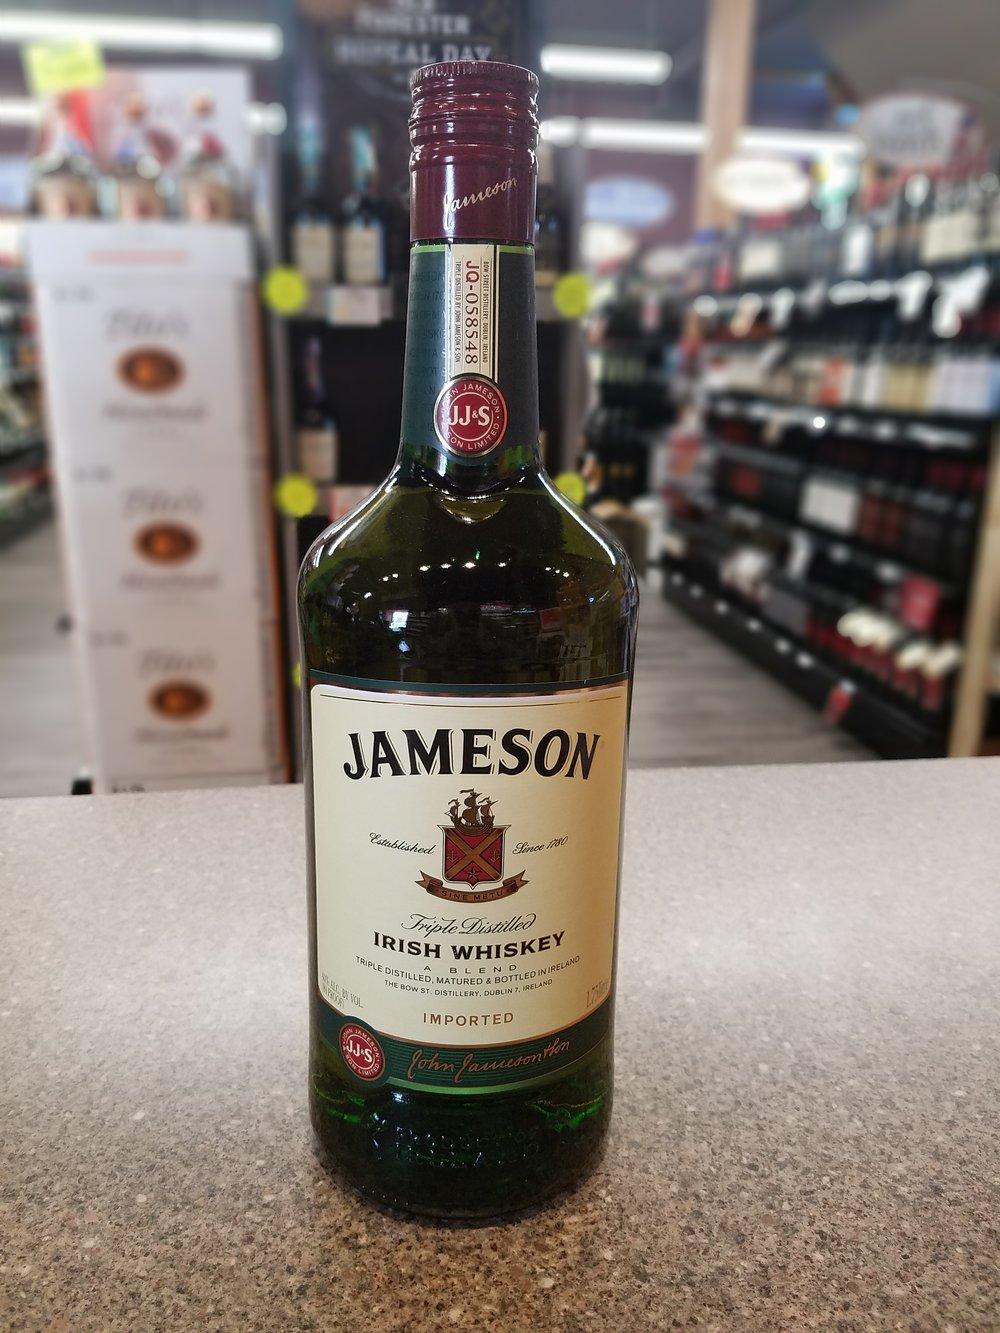 Jameson 1.75L - $40.99